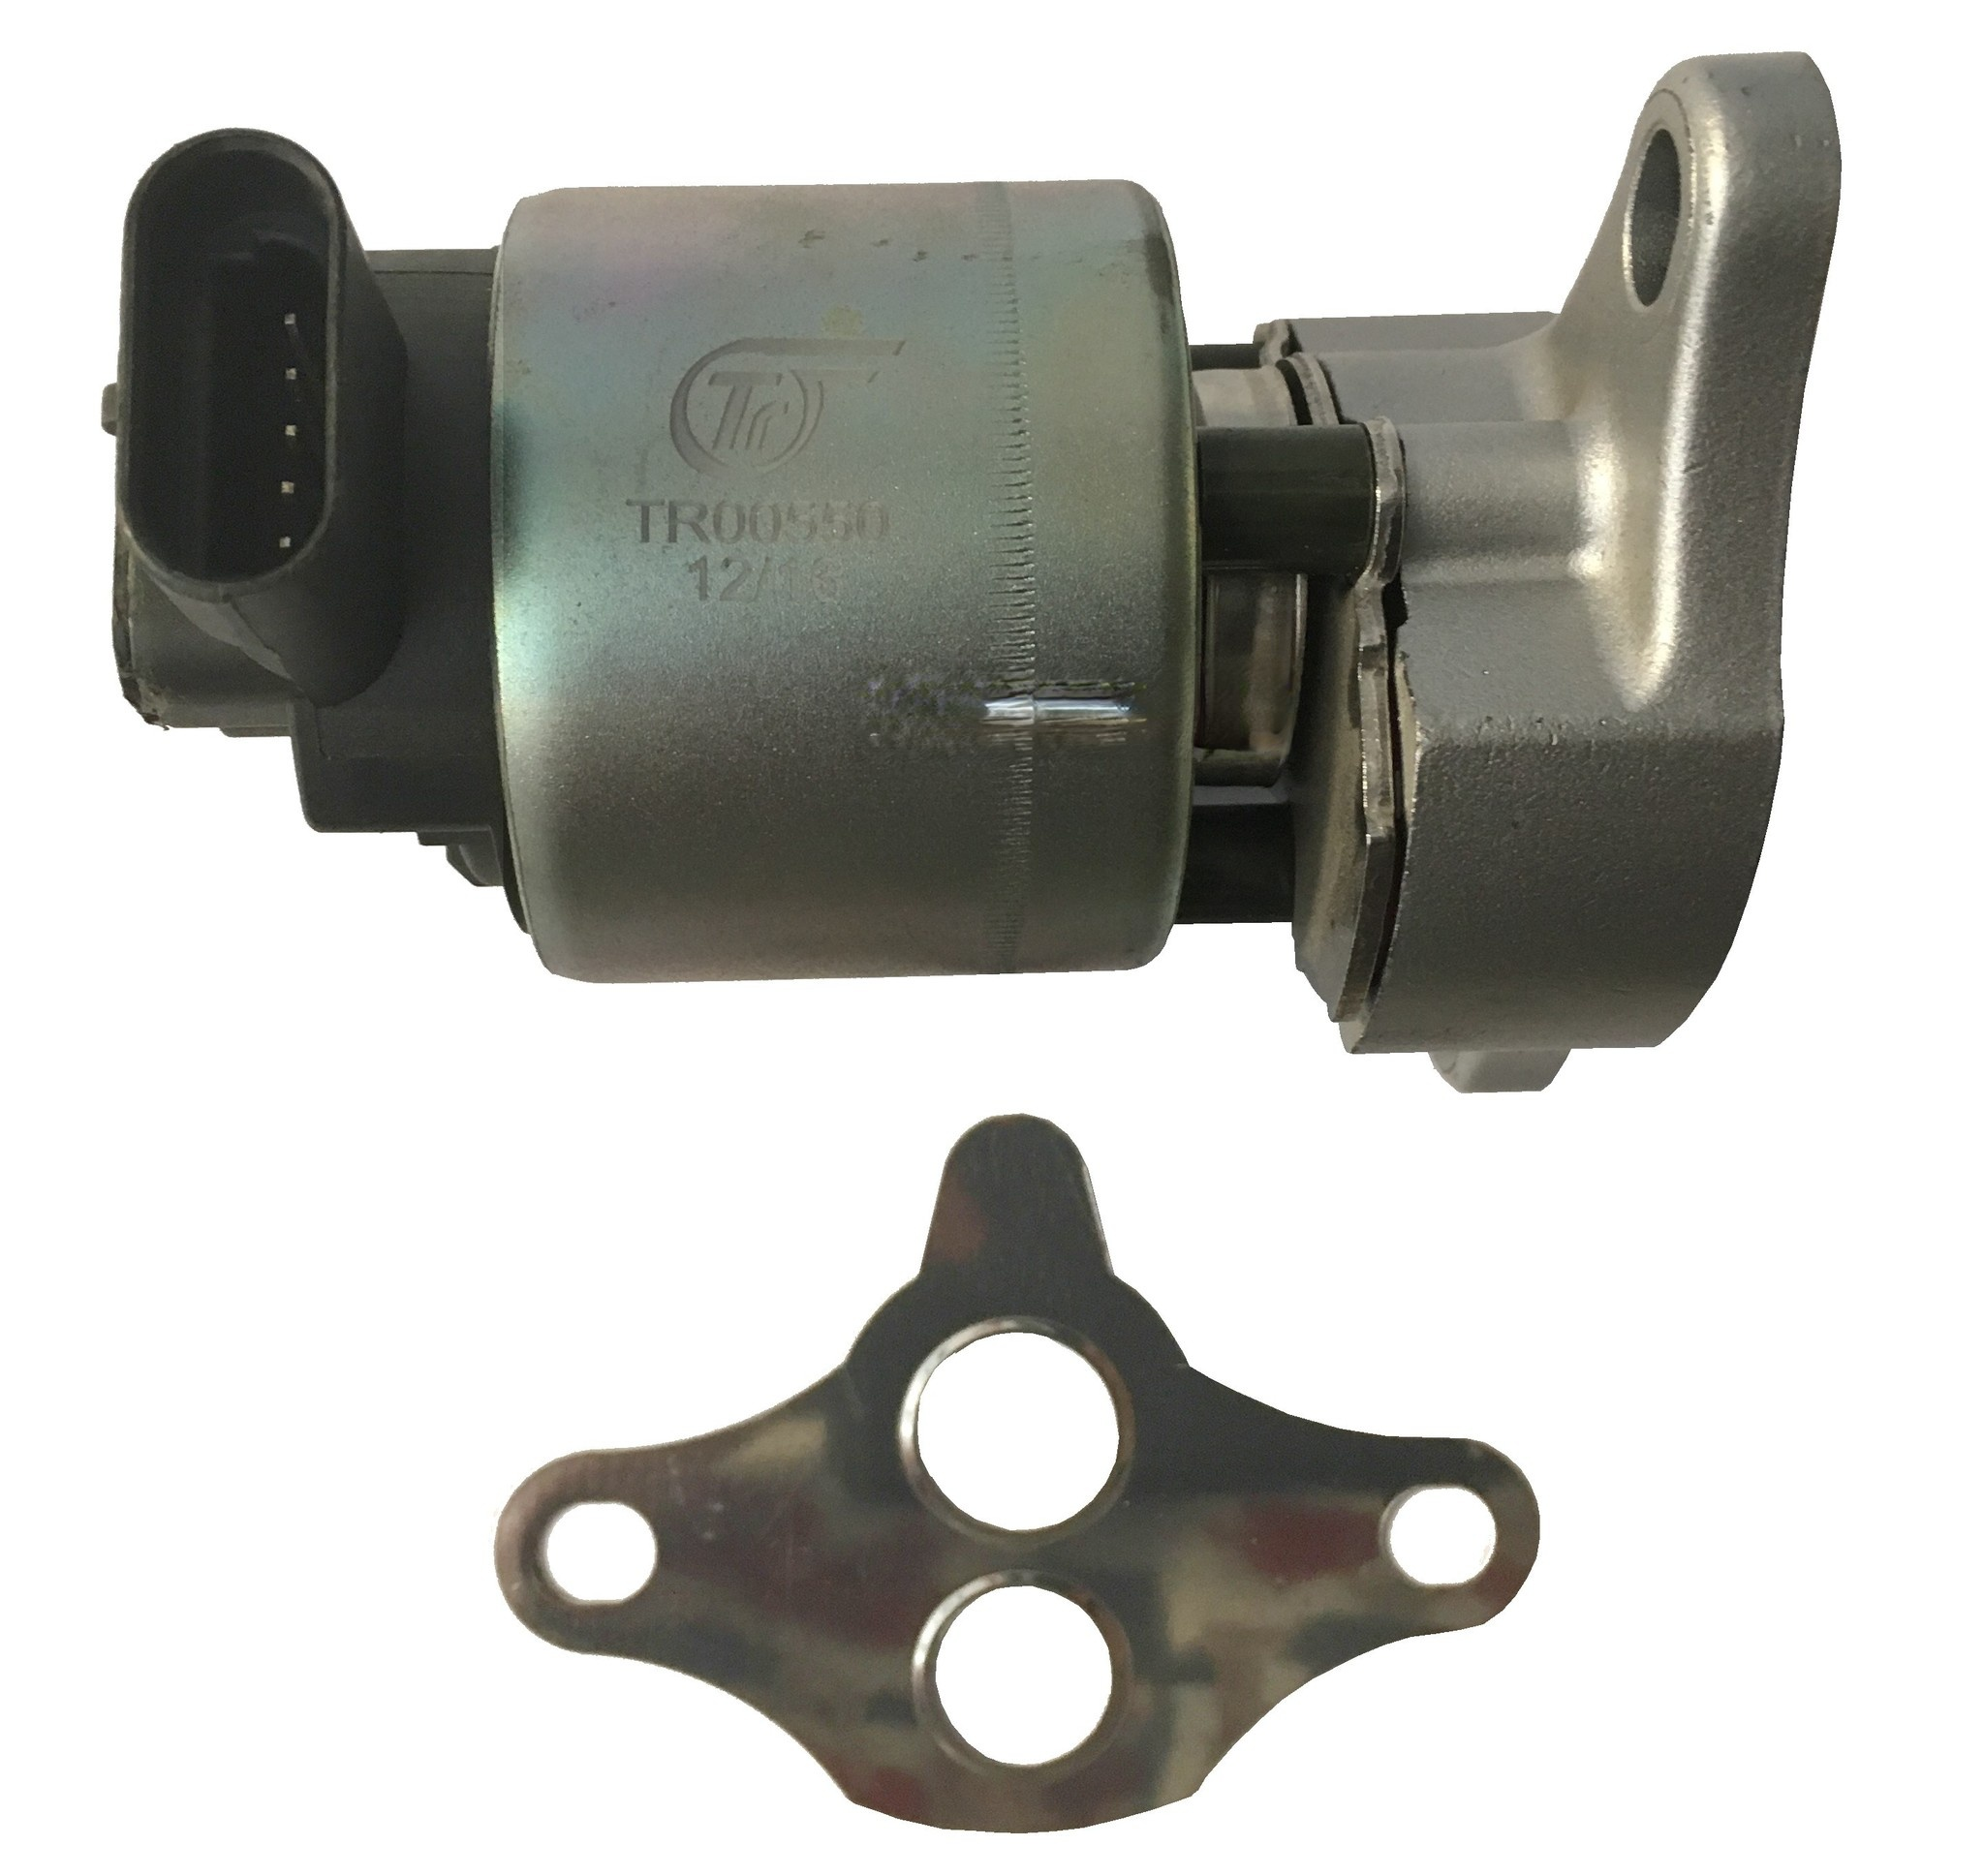 EGR ventil - TR00550 Opel Omega Vectra 2.6 EGR/AGR ventily prémiové kvality